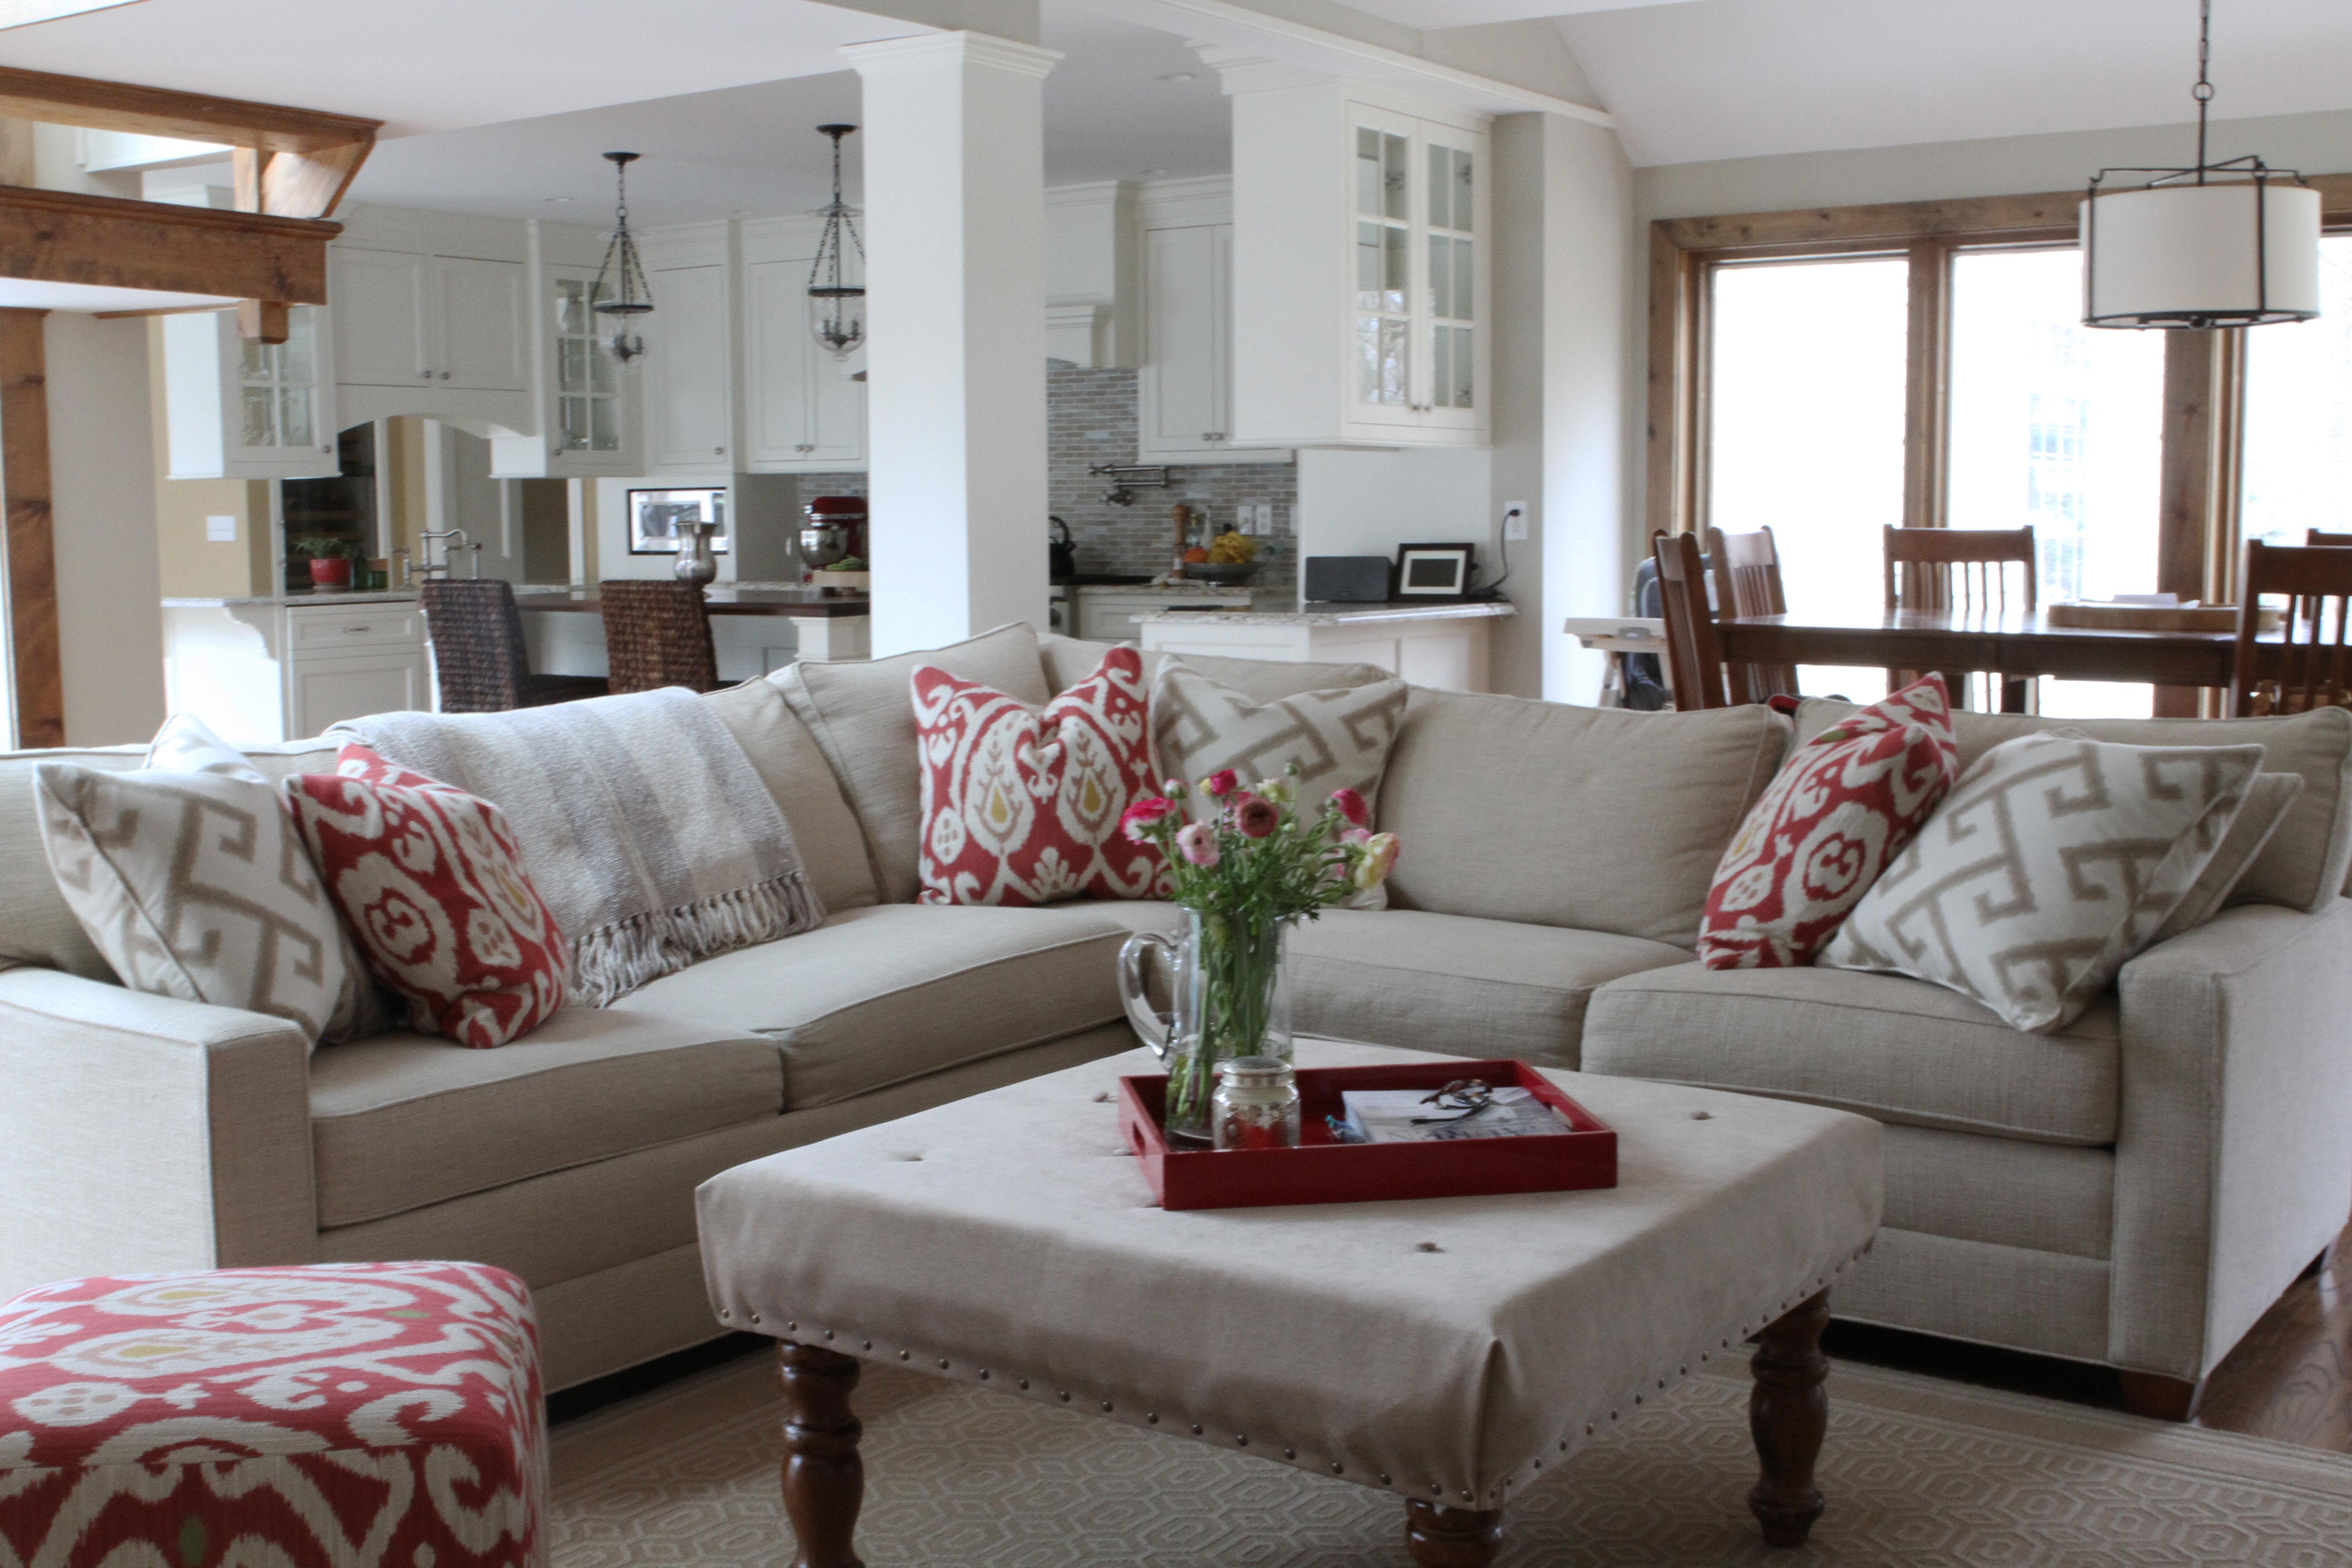 of inspirational decorative beautiful metal wall living goods room for pillows home art pillow